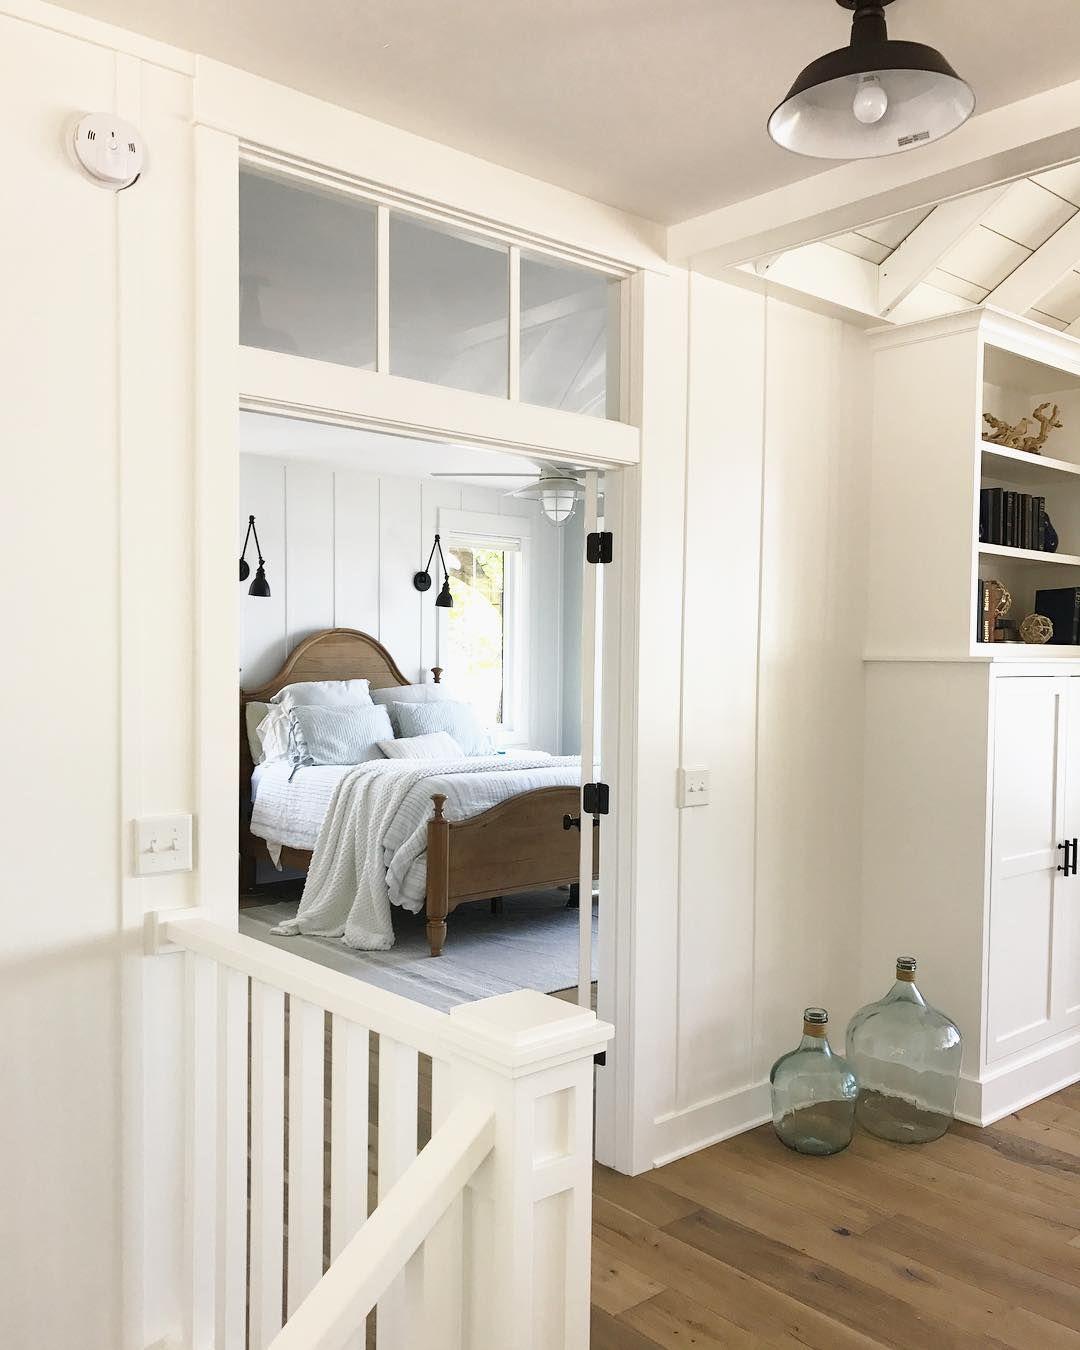 Hallway trim ideas  clean crisp and gorgeous woodwork  Inner decoration  Pinterest